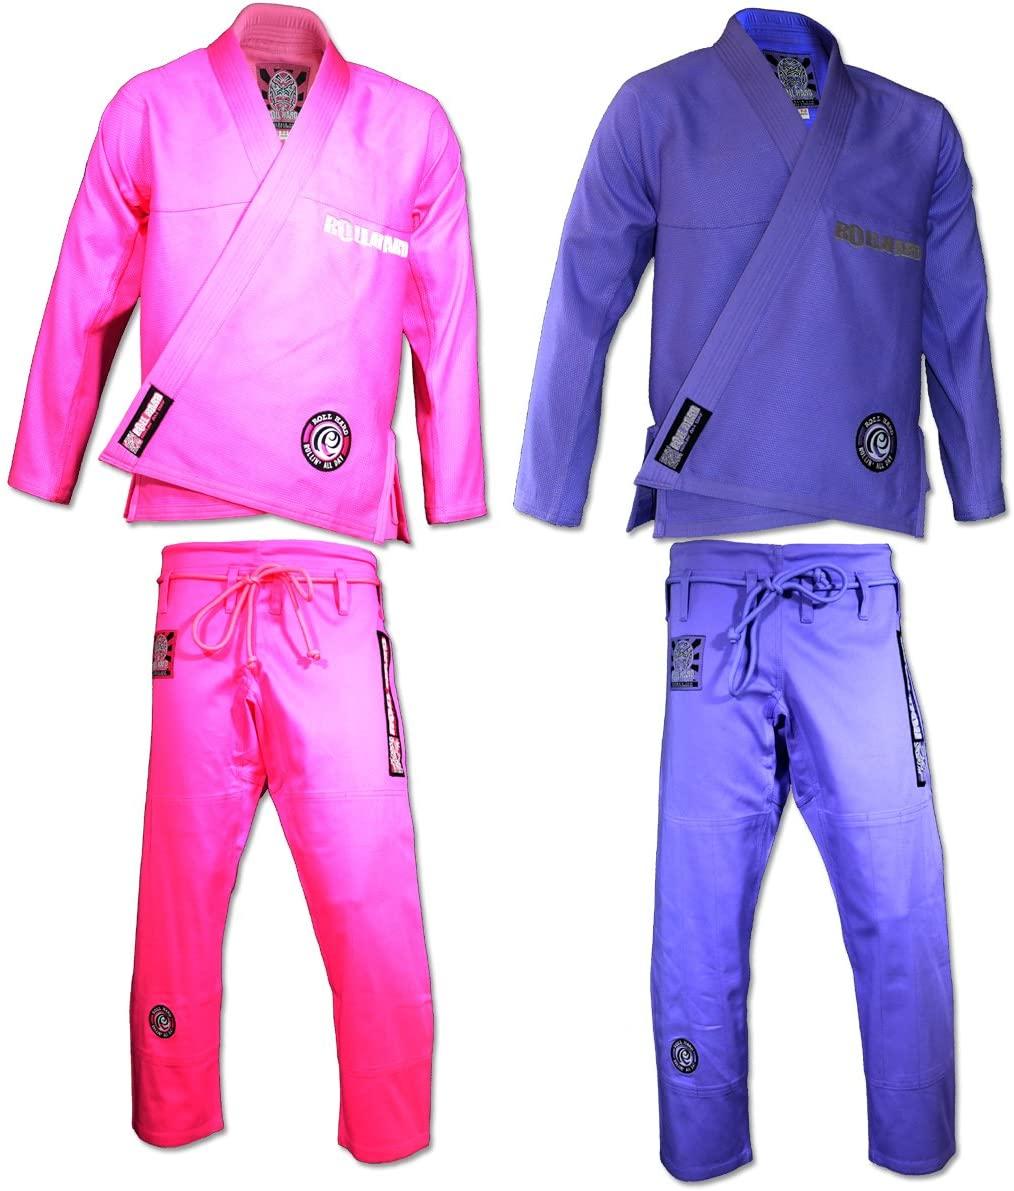 ROLL HARD Brand Womens Brazilian Jiu Jitsu Kimonos - Pink or Purple